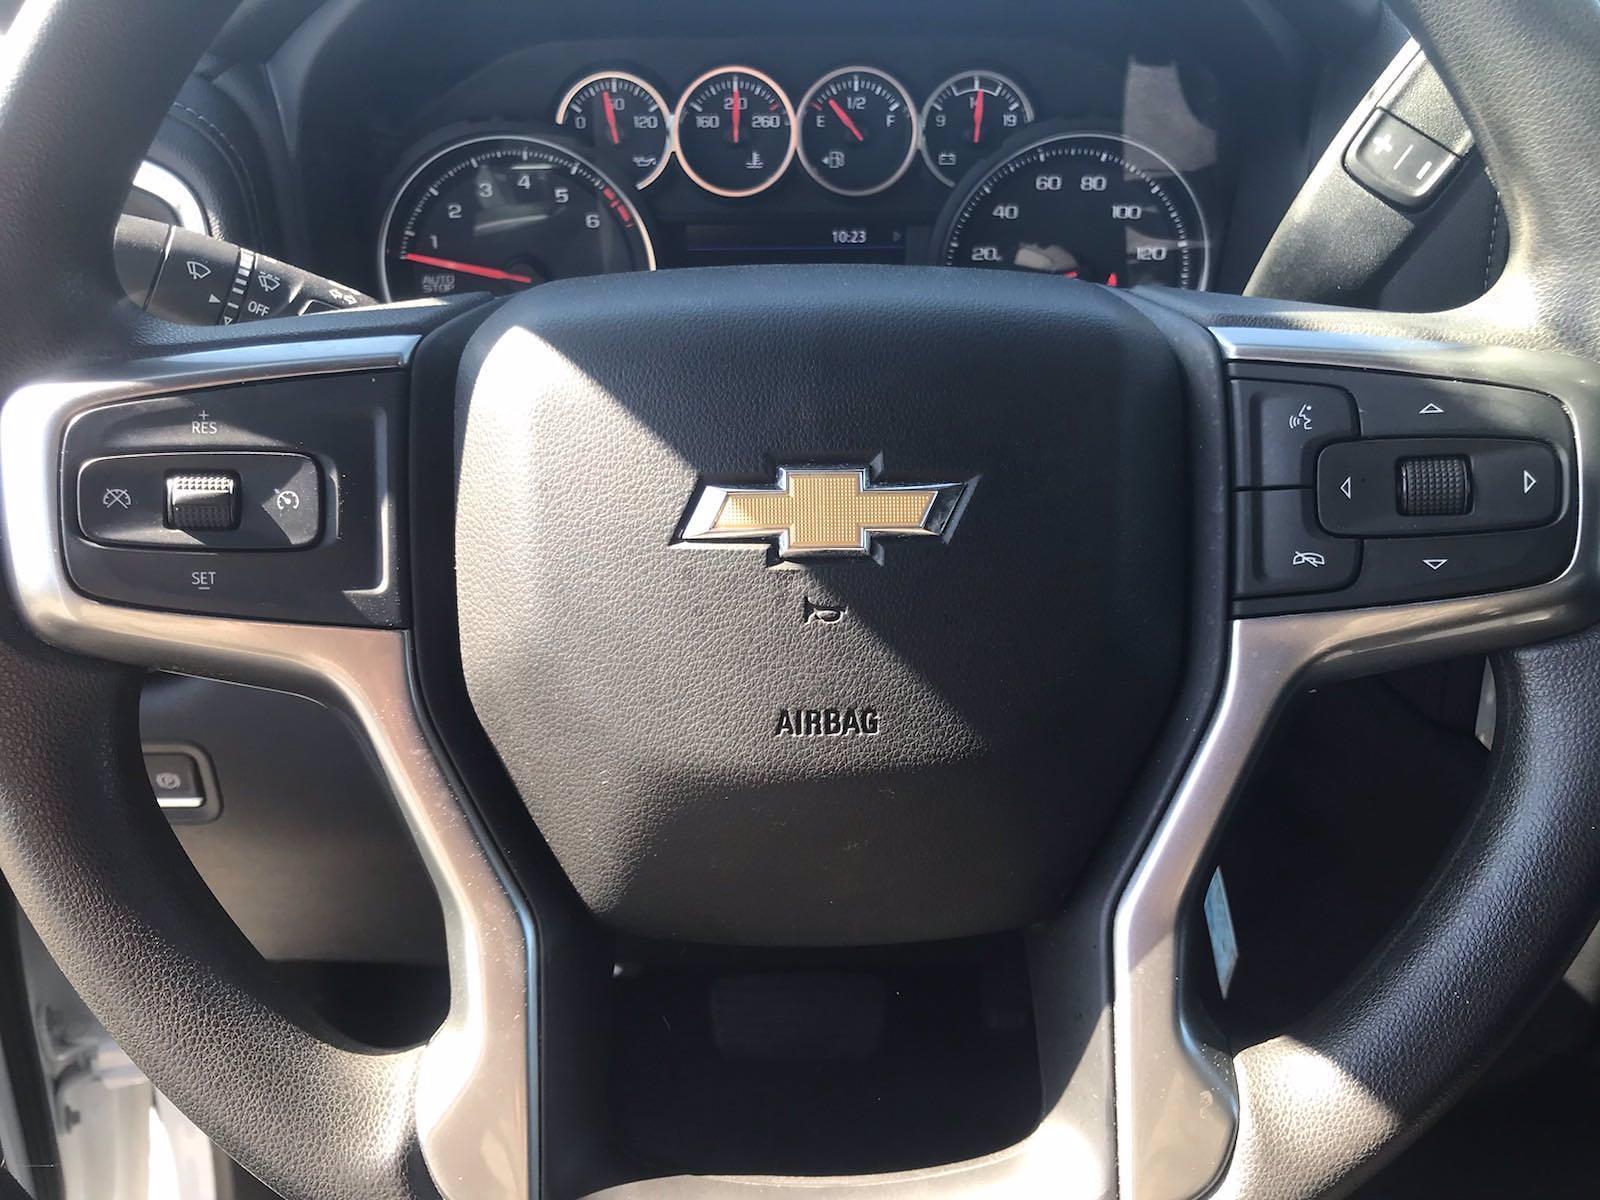 2020 Chevrolet Silverado 1500 Crew Cab 4x4, Pickup #16423PN - photo 24